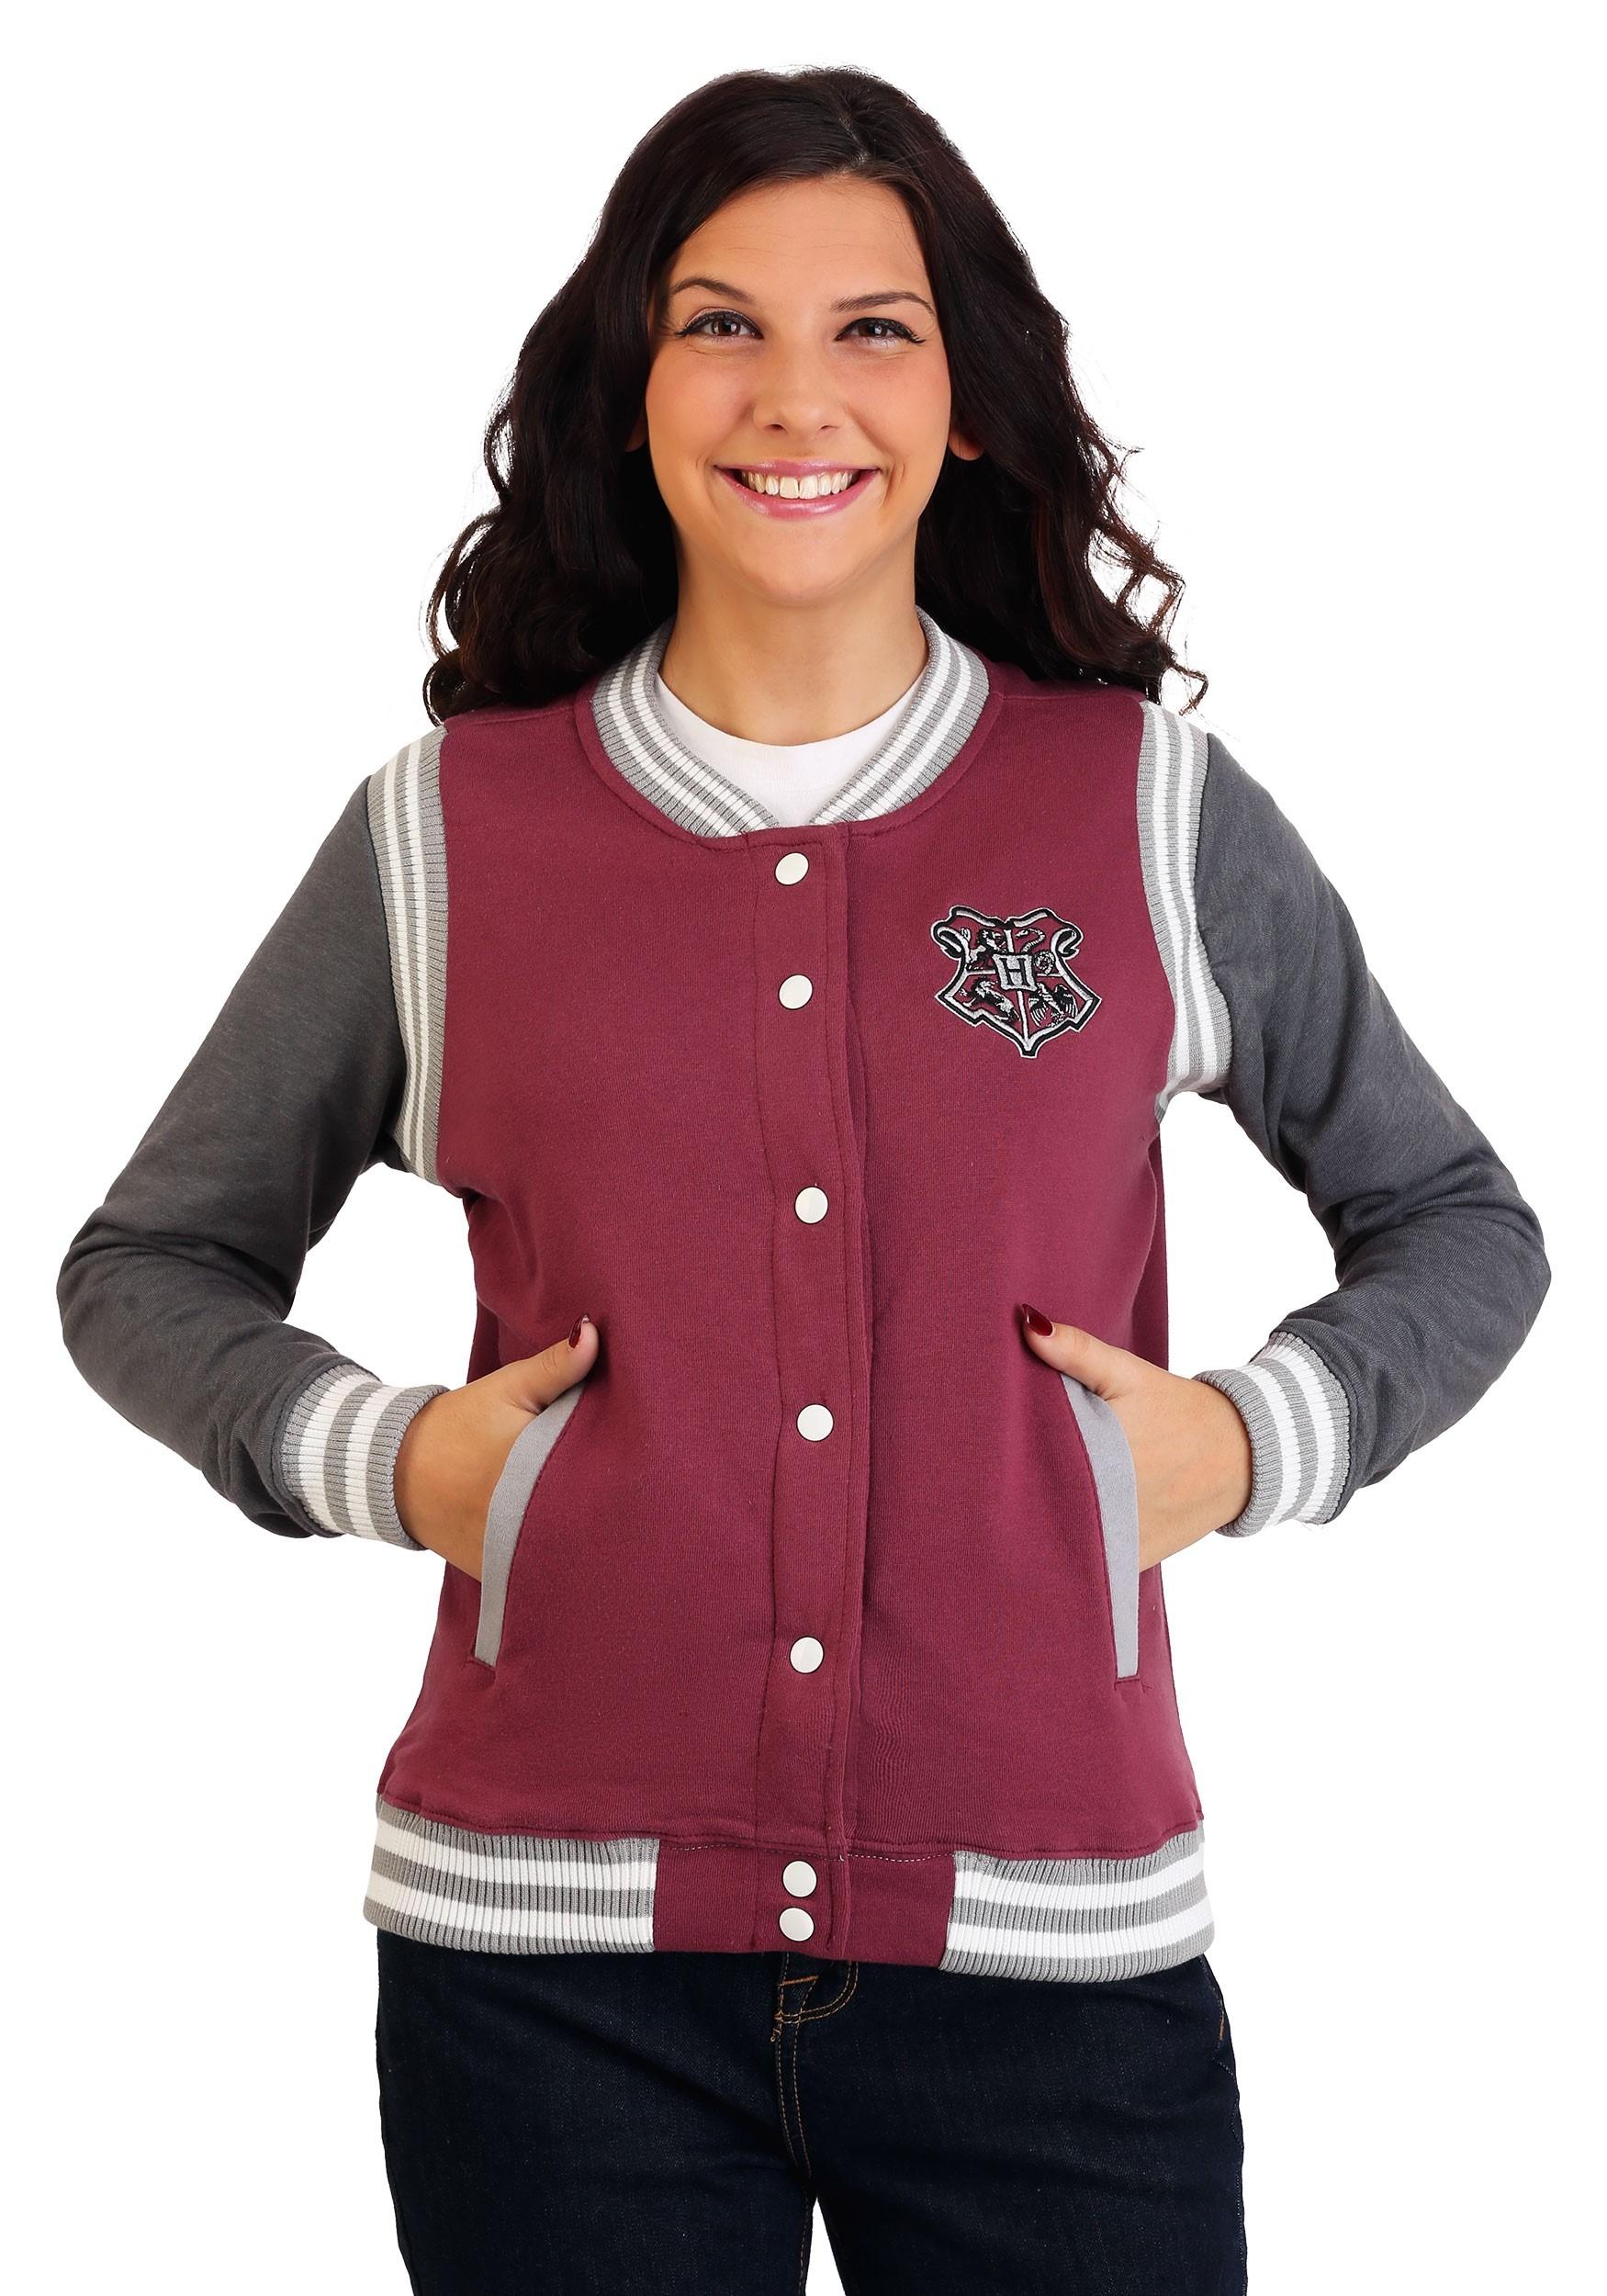 0aae27531e34 Women s Harry Potter Hogwarts Varsity Jacket Update Main